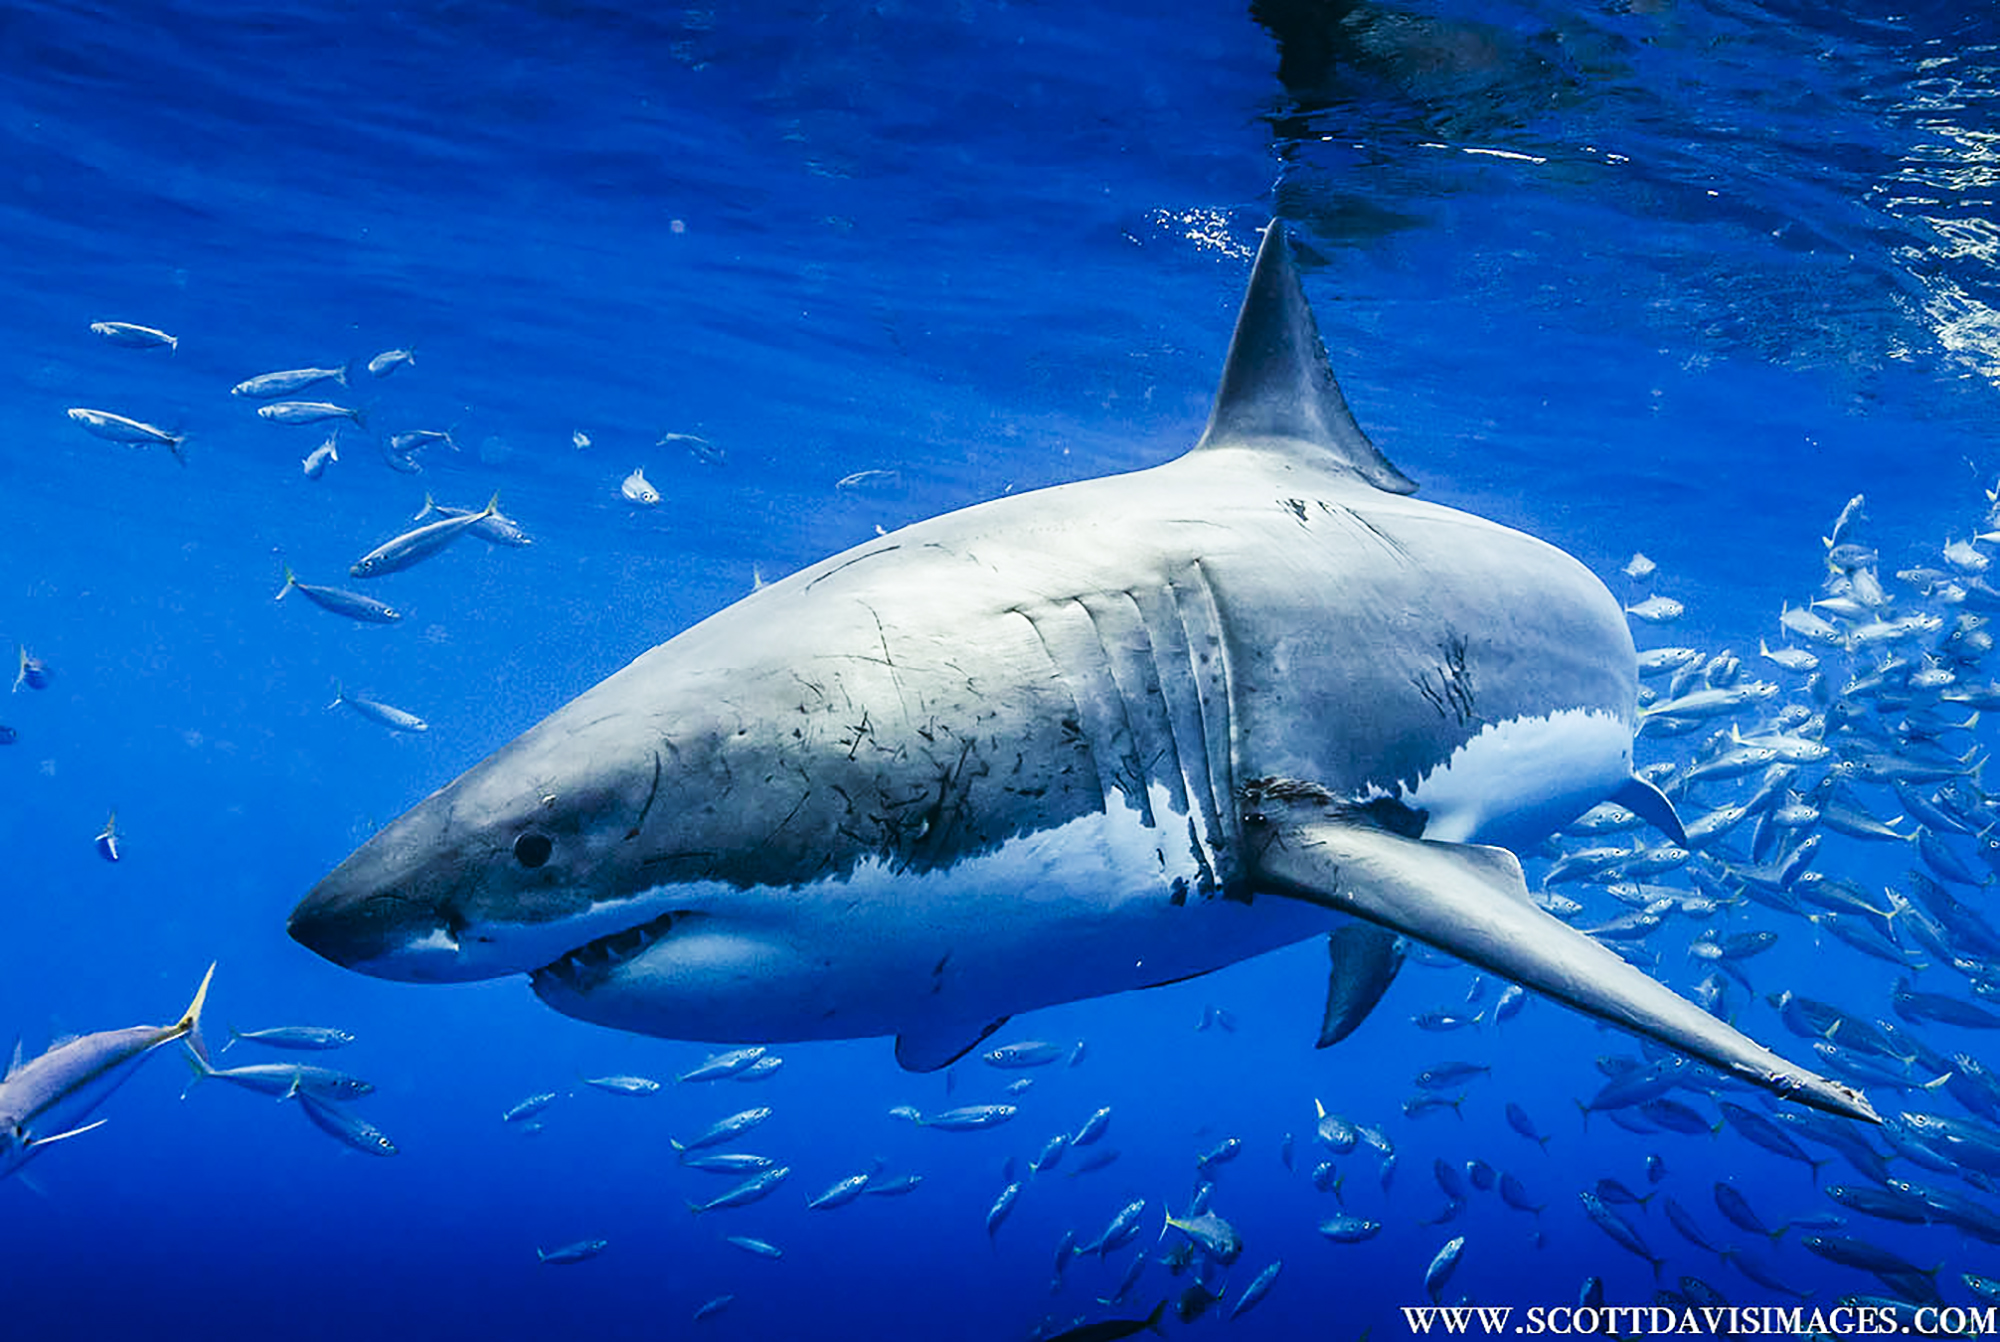 Cheeseman's Guadalupe Great White Shark Trip